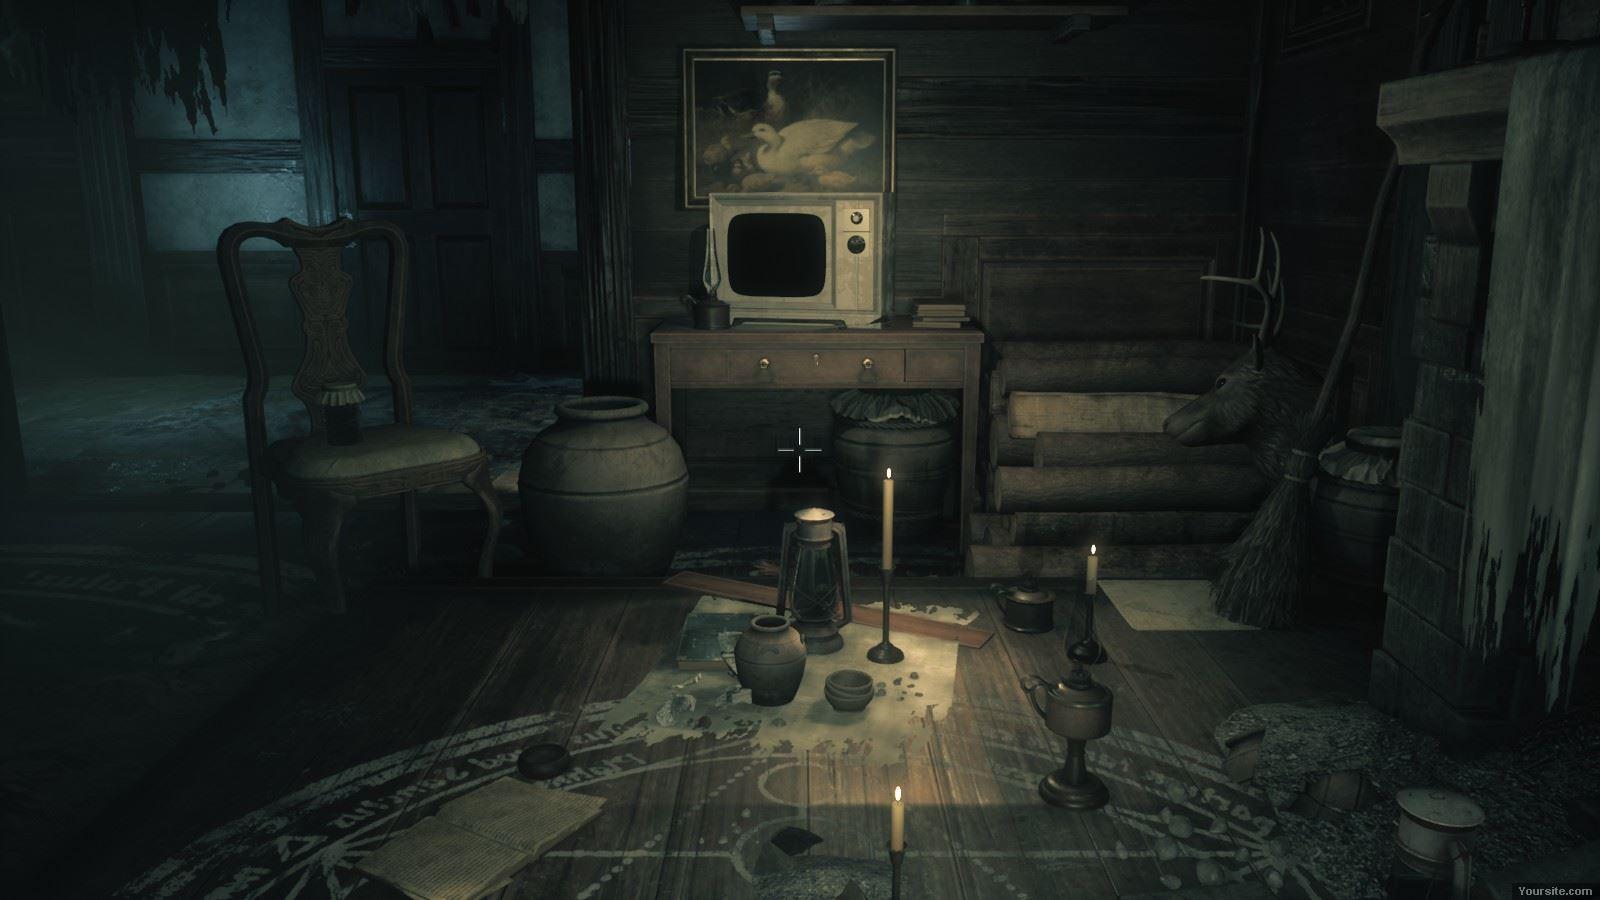 Скриншот 25 Cadre of Death: Episode 1 (2018) PC